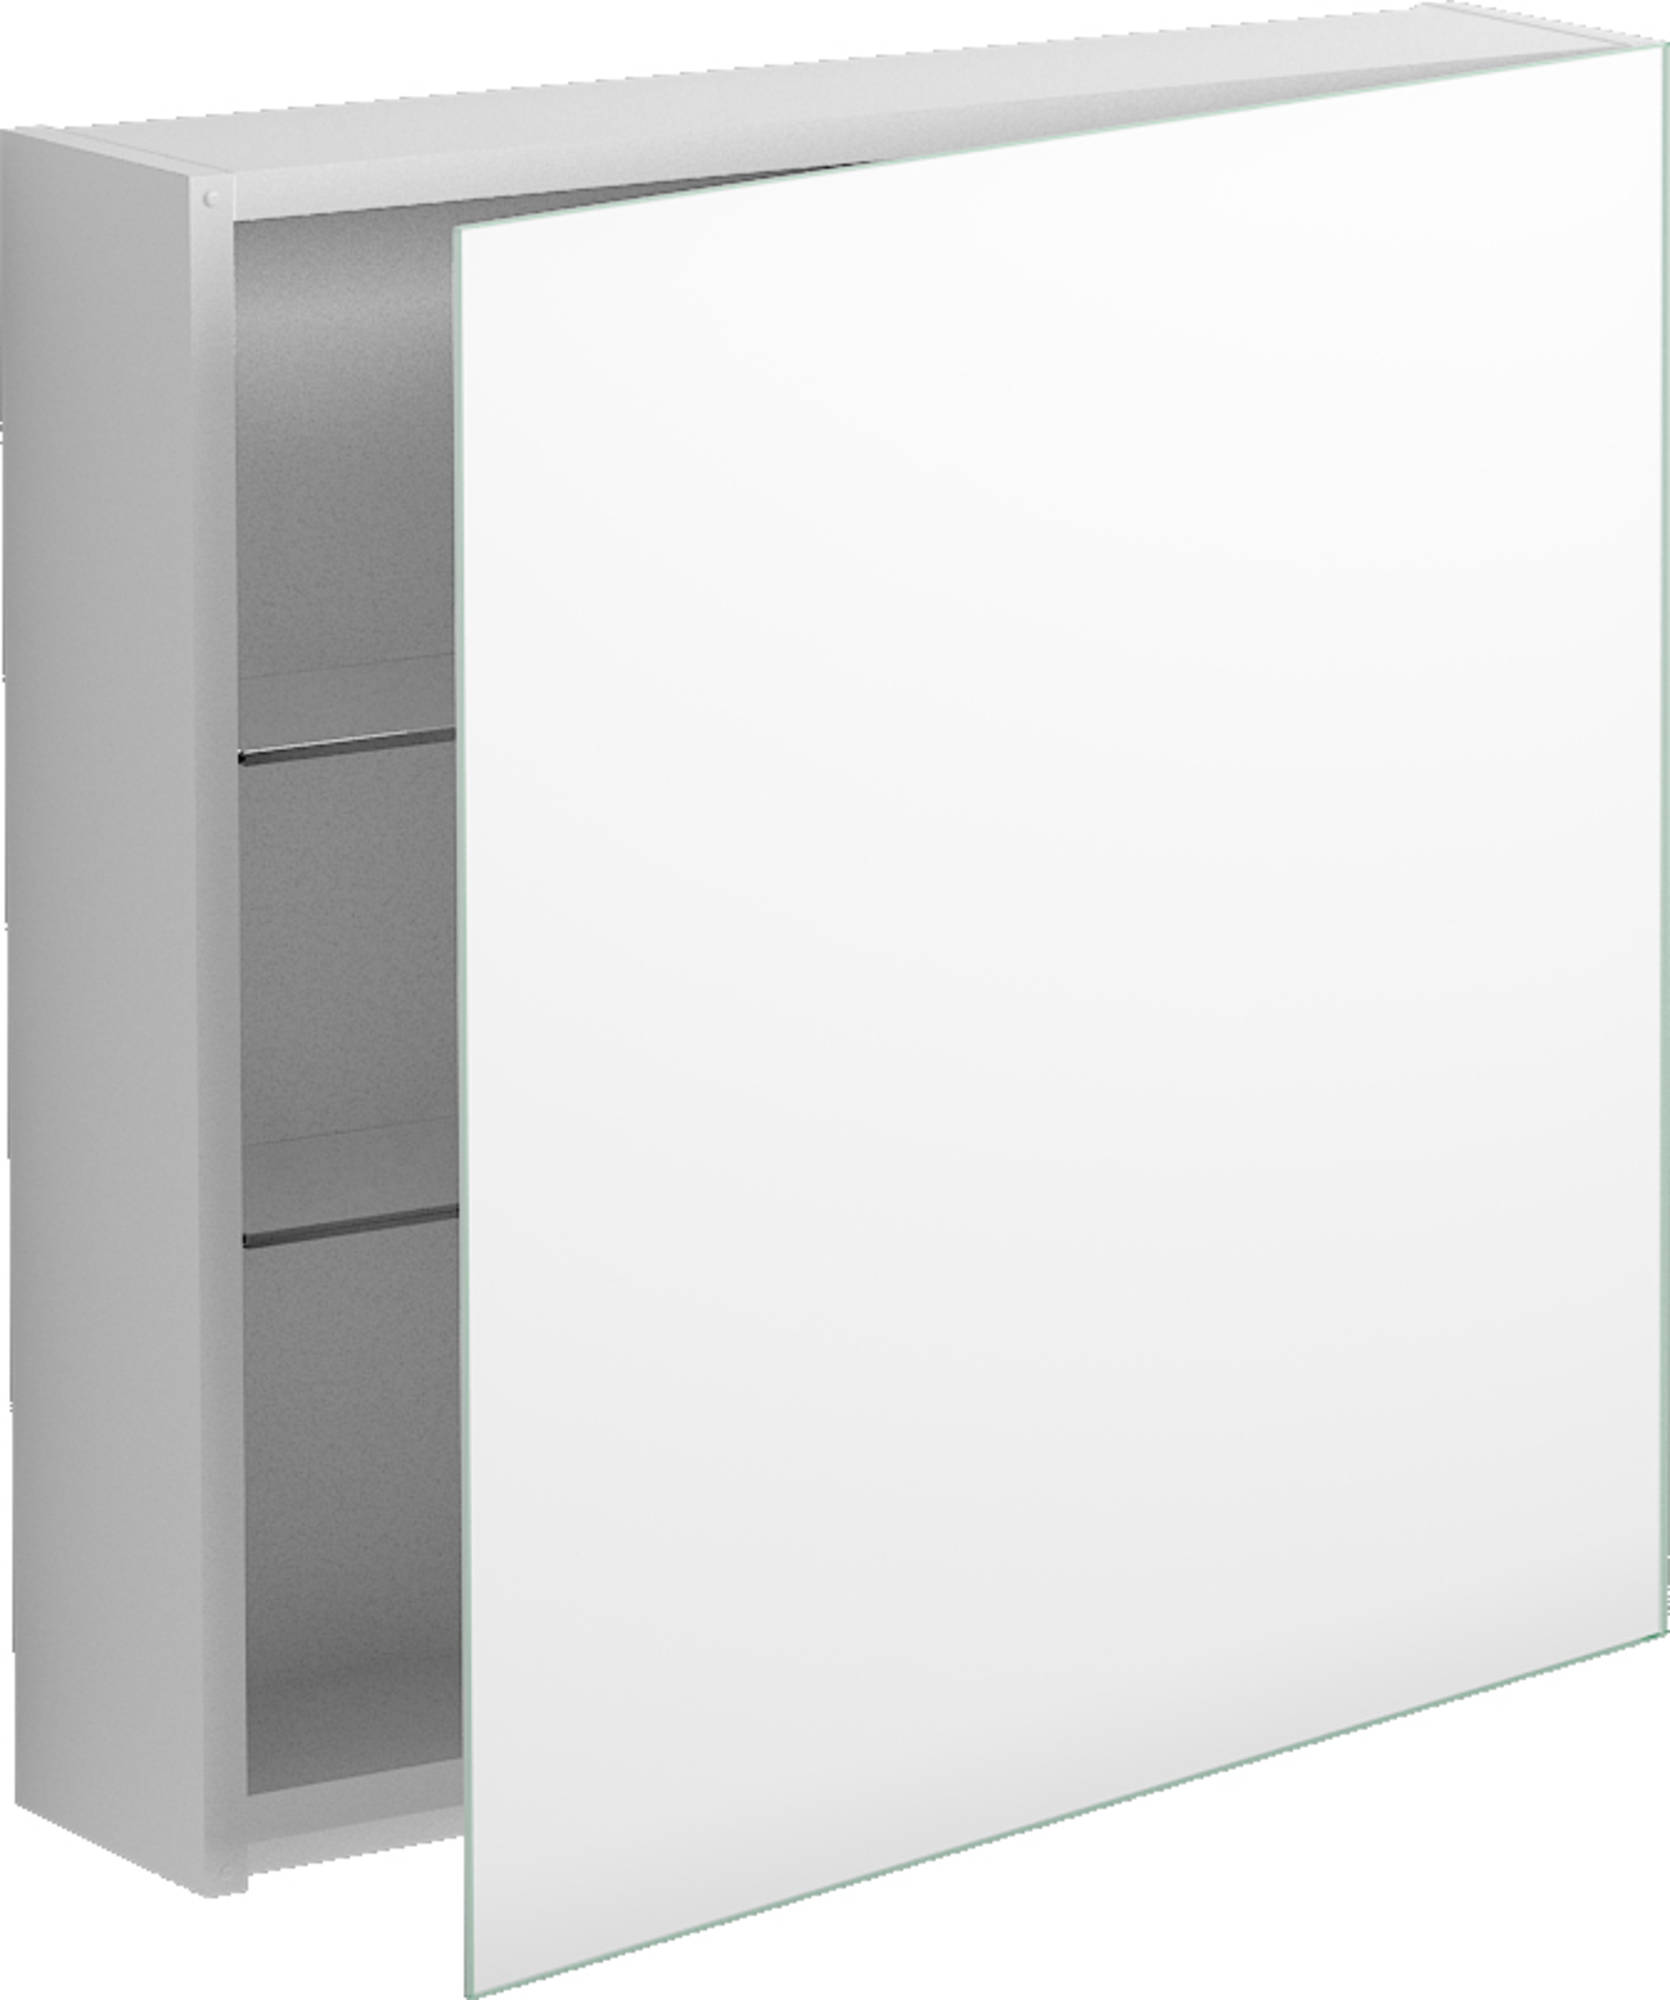 Clou Match Me Spiegelkast 70x16,7x68 cm Wit Hoogglans Gelakt